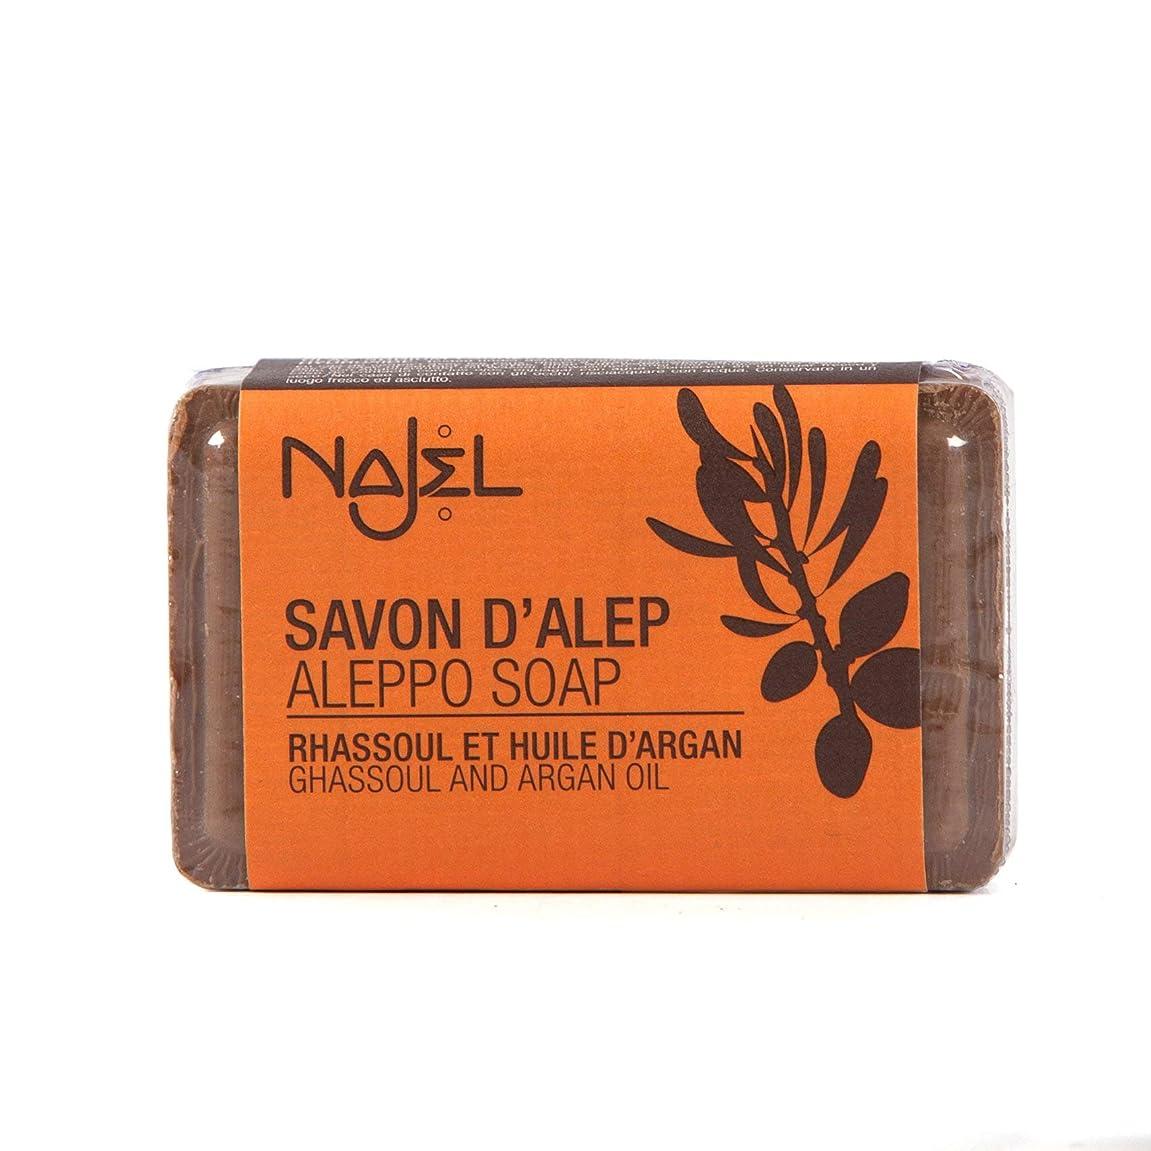 Najel Aleppo Soap Rhassoul and Argan Oil - 100g by Najel kk337568191752